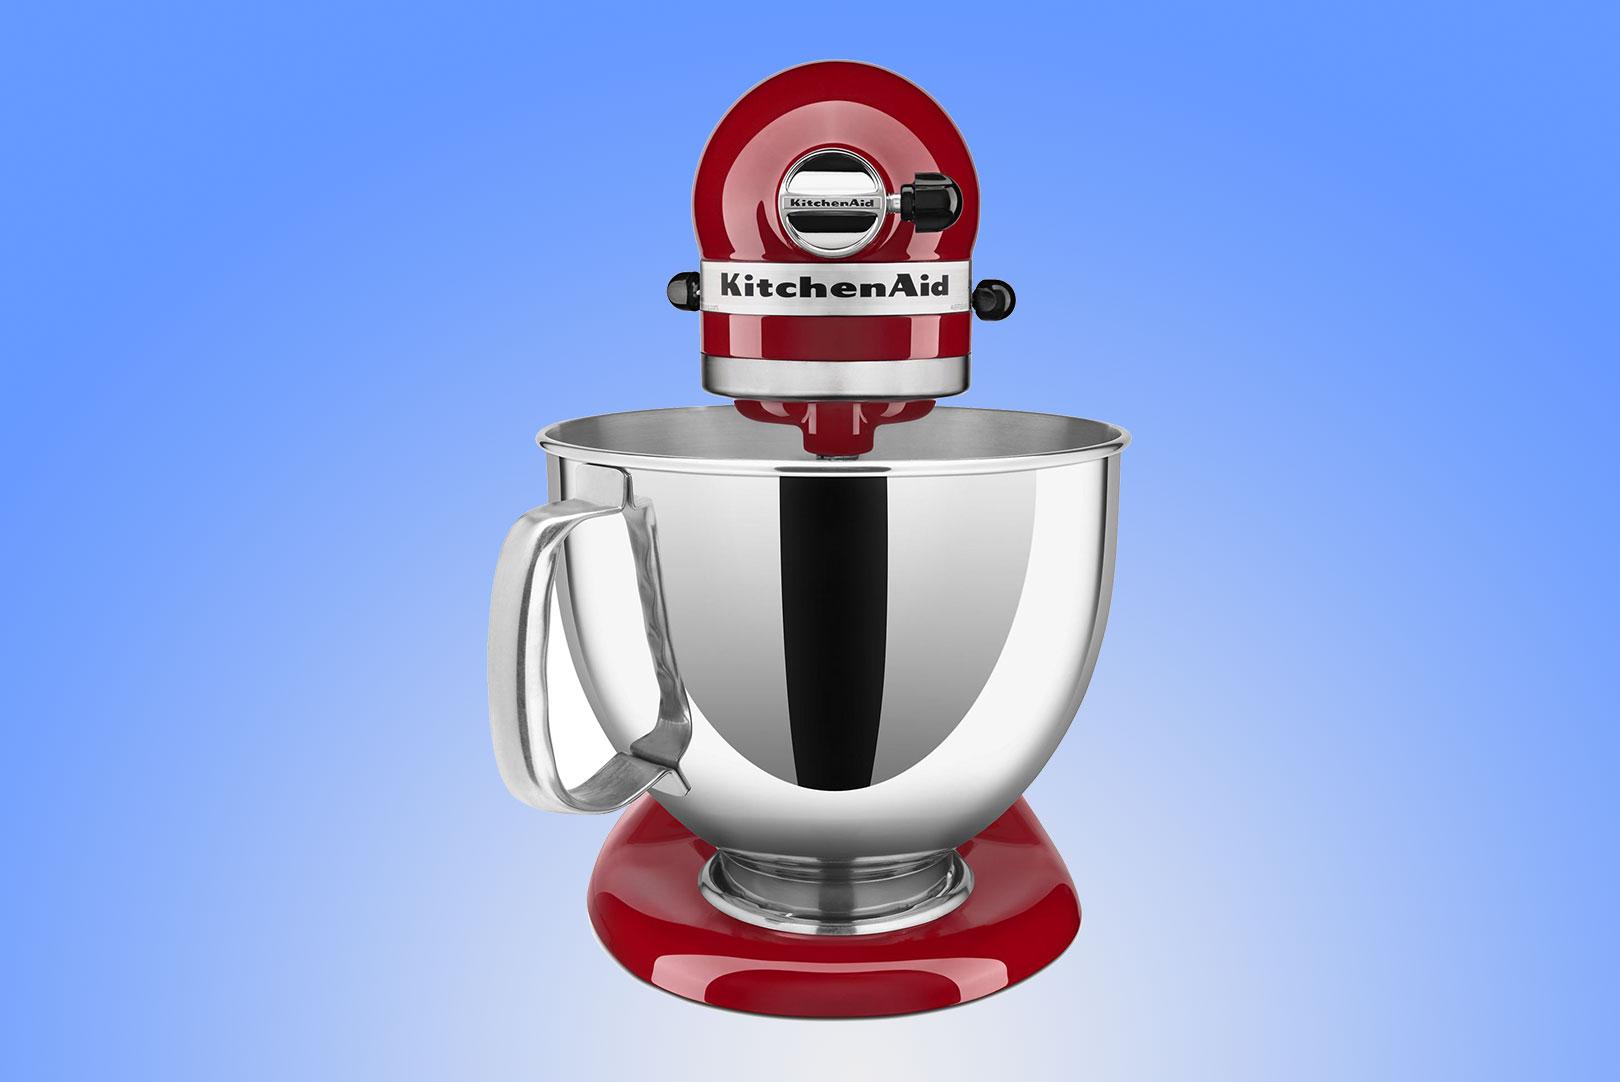 KitchenAid Artisan Stand Mixer, 5 qt